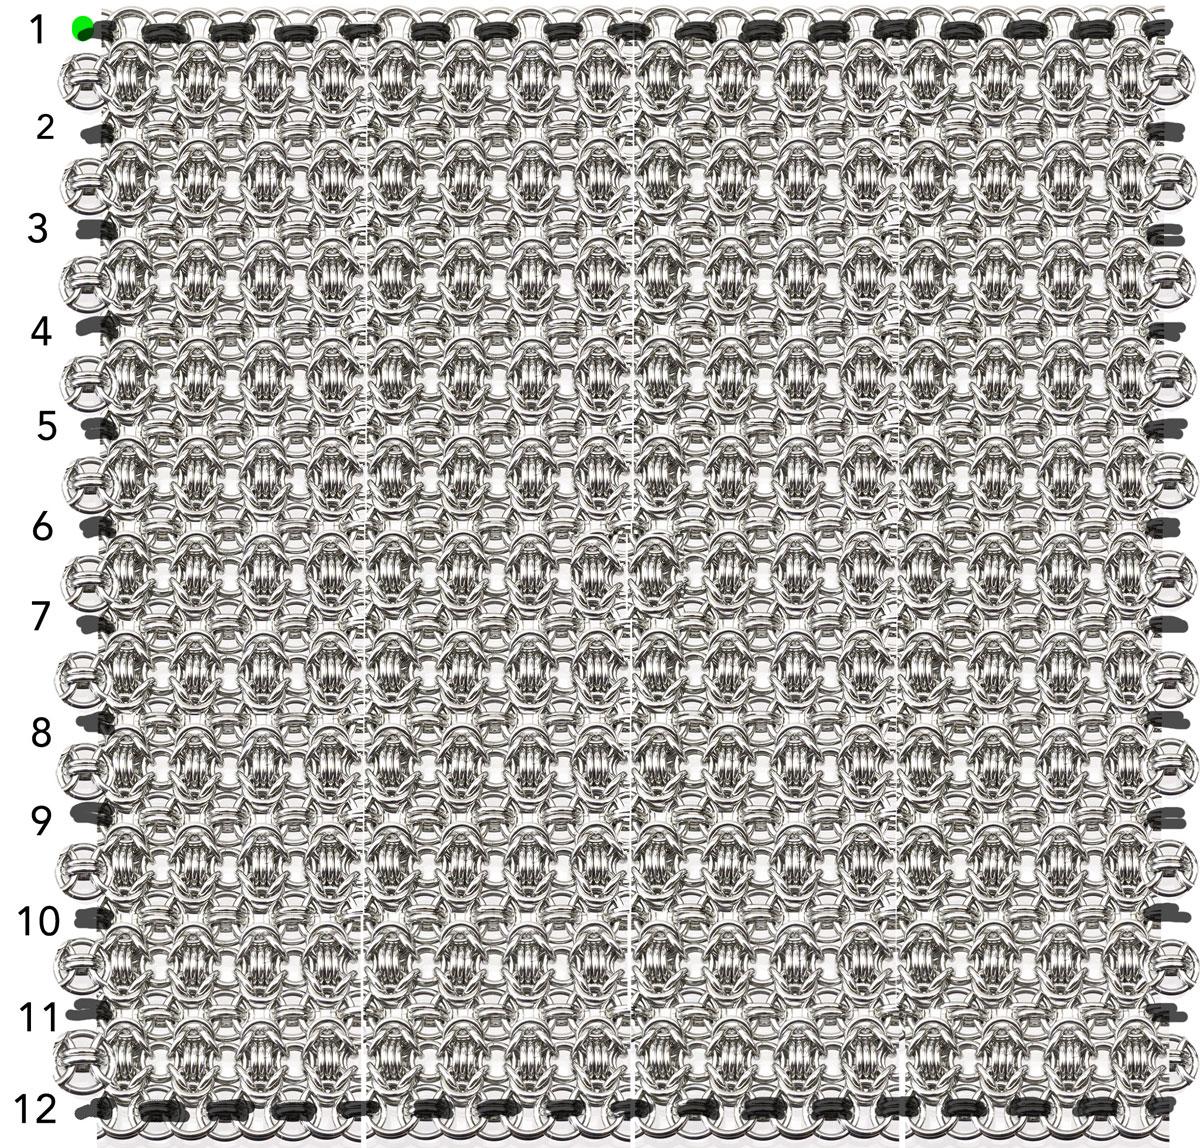 rondo-a-la-byzantine-sheet-coloring-paper